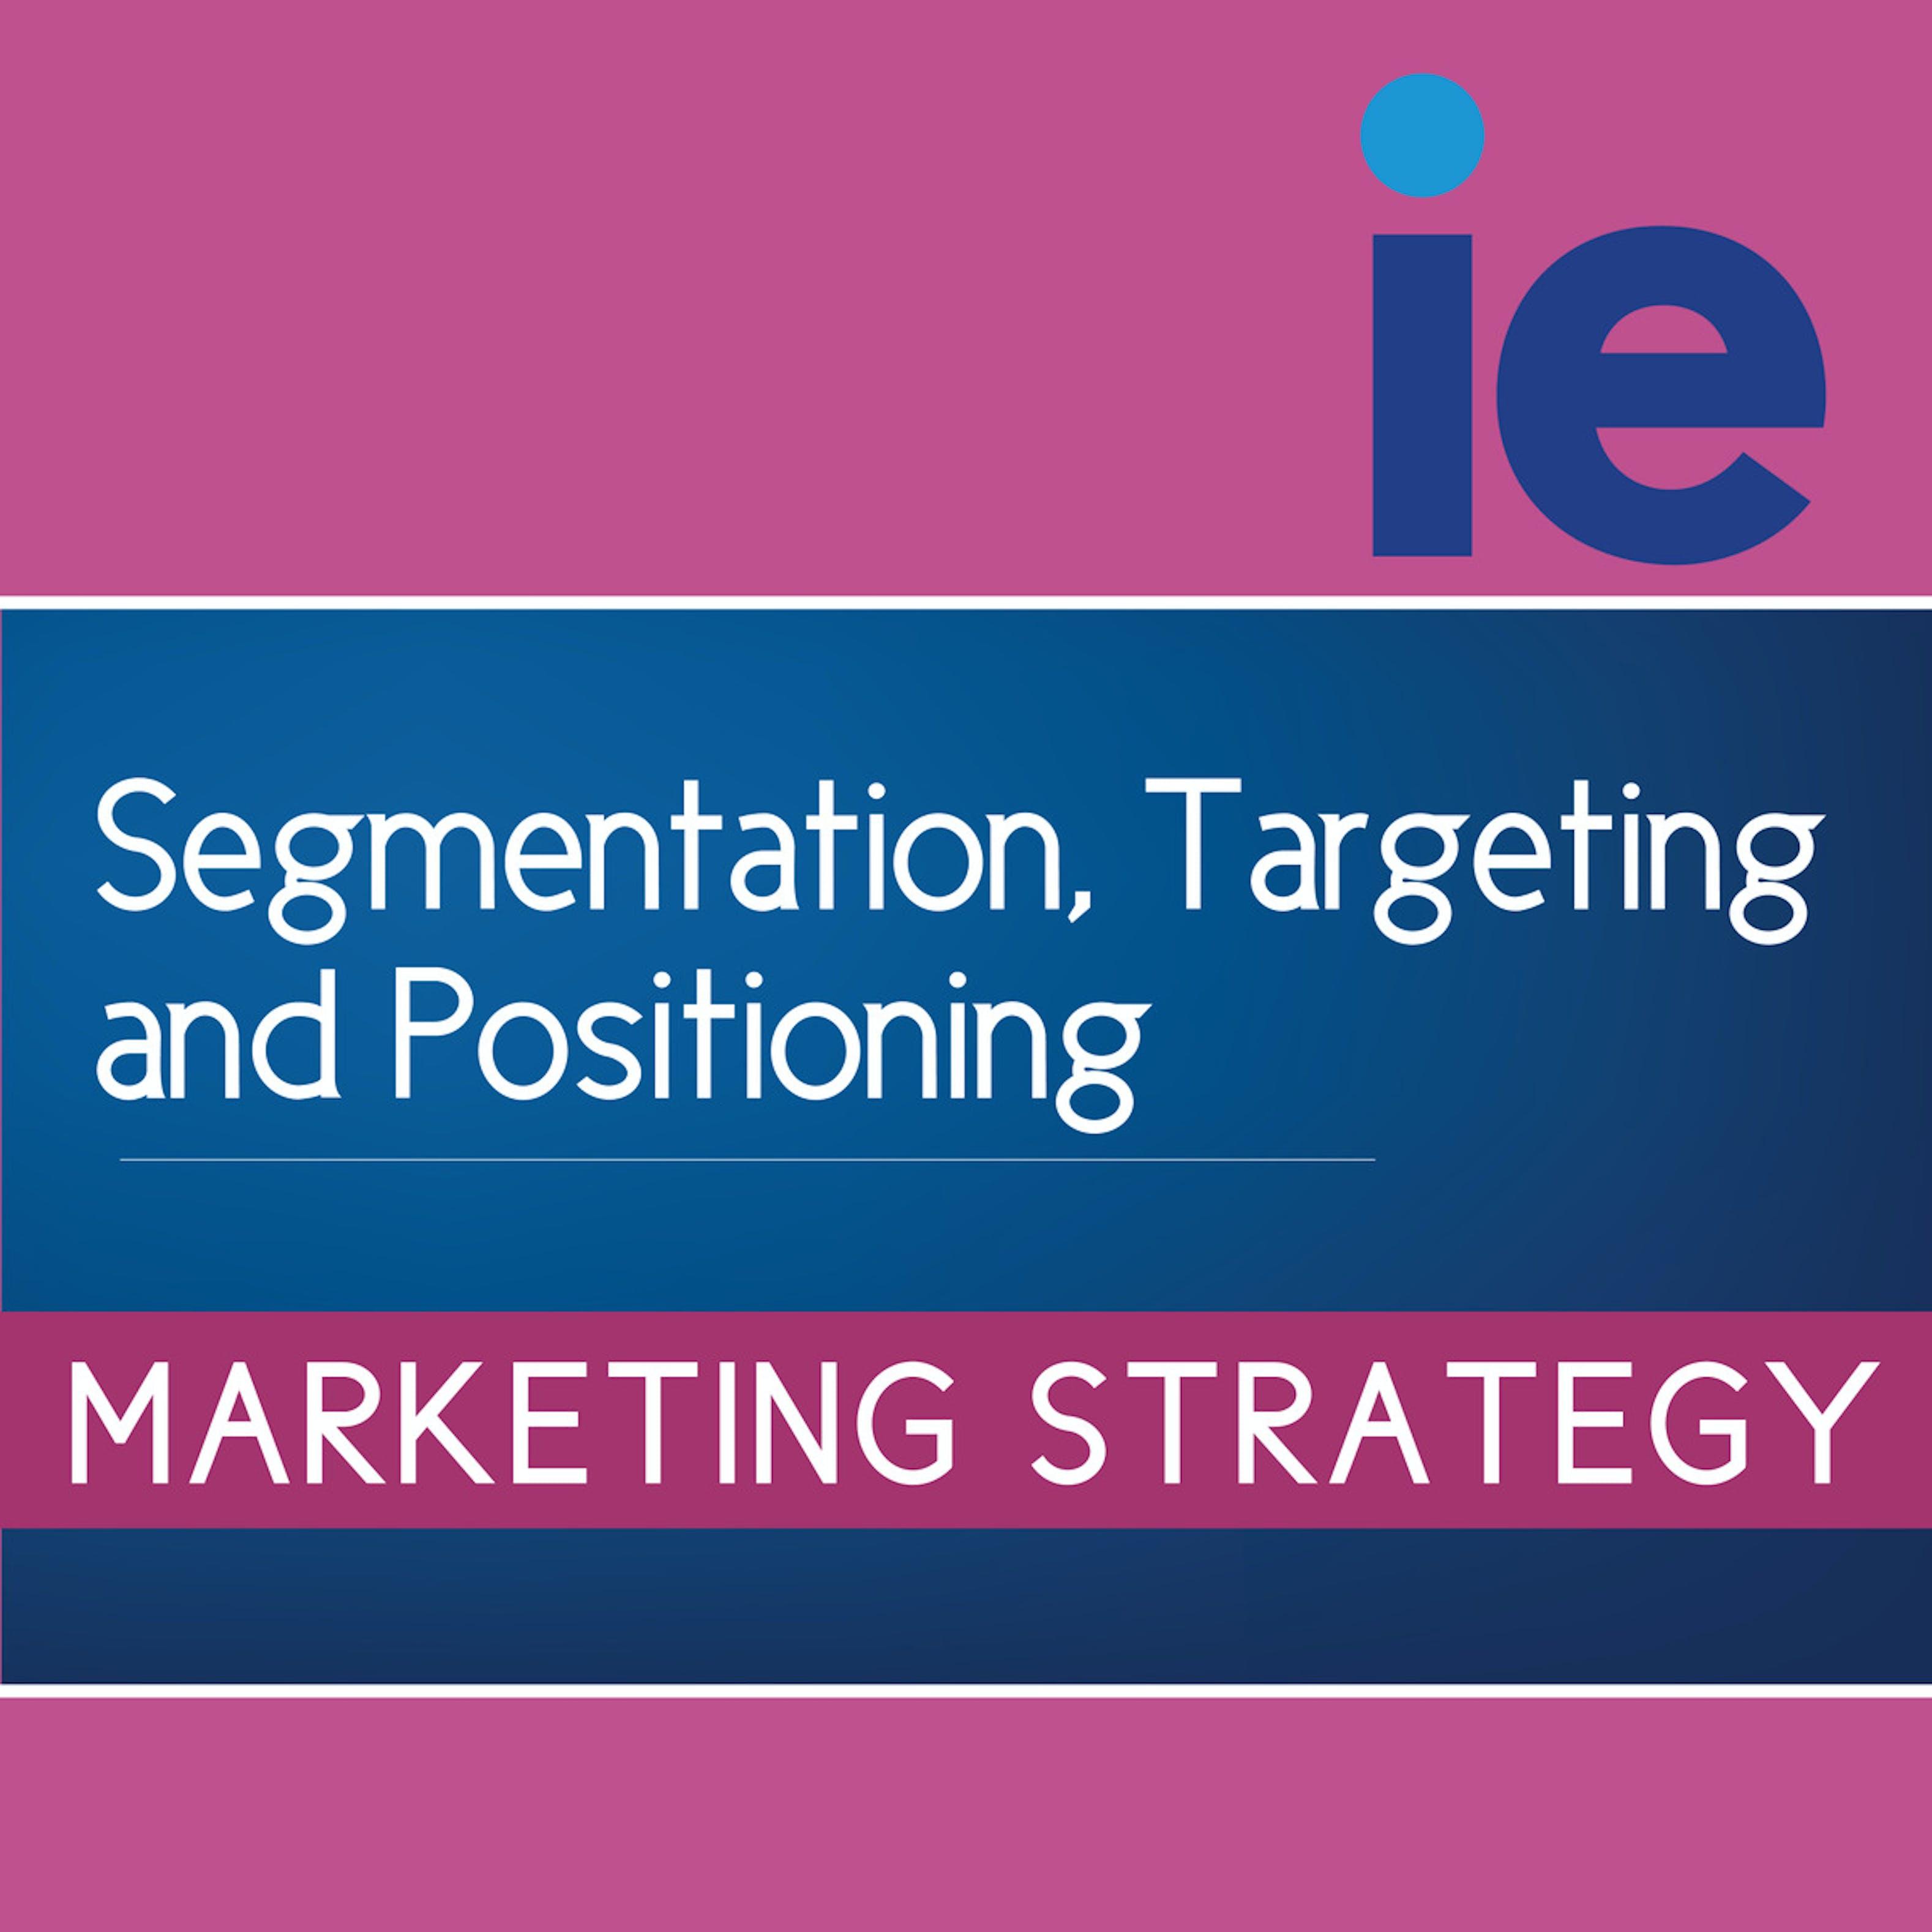 unilever market segmentation strategy